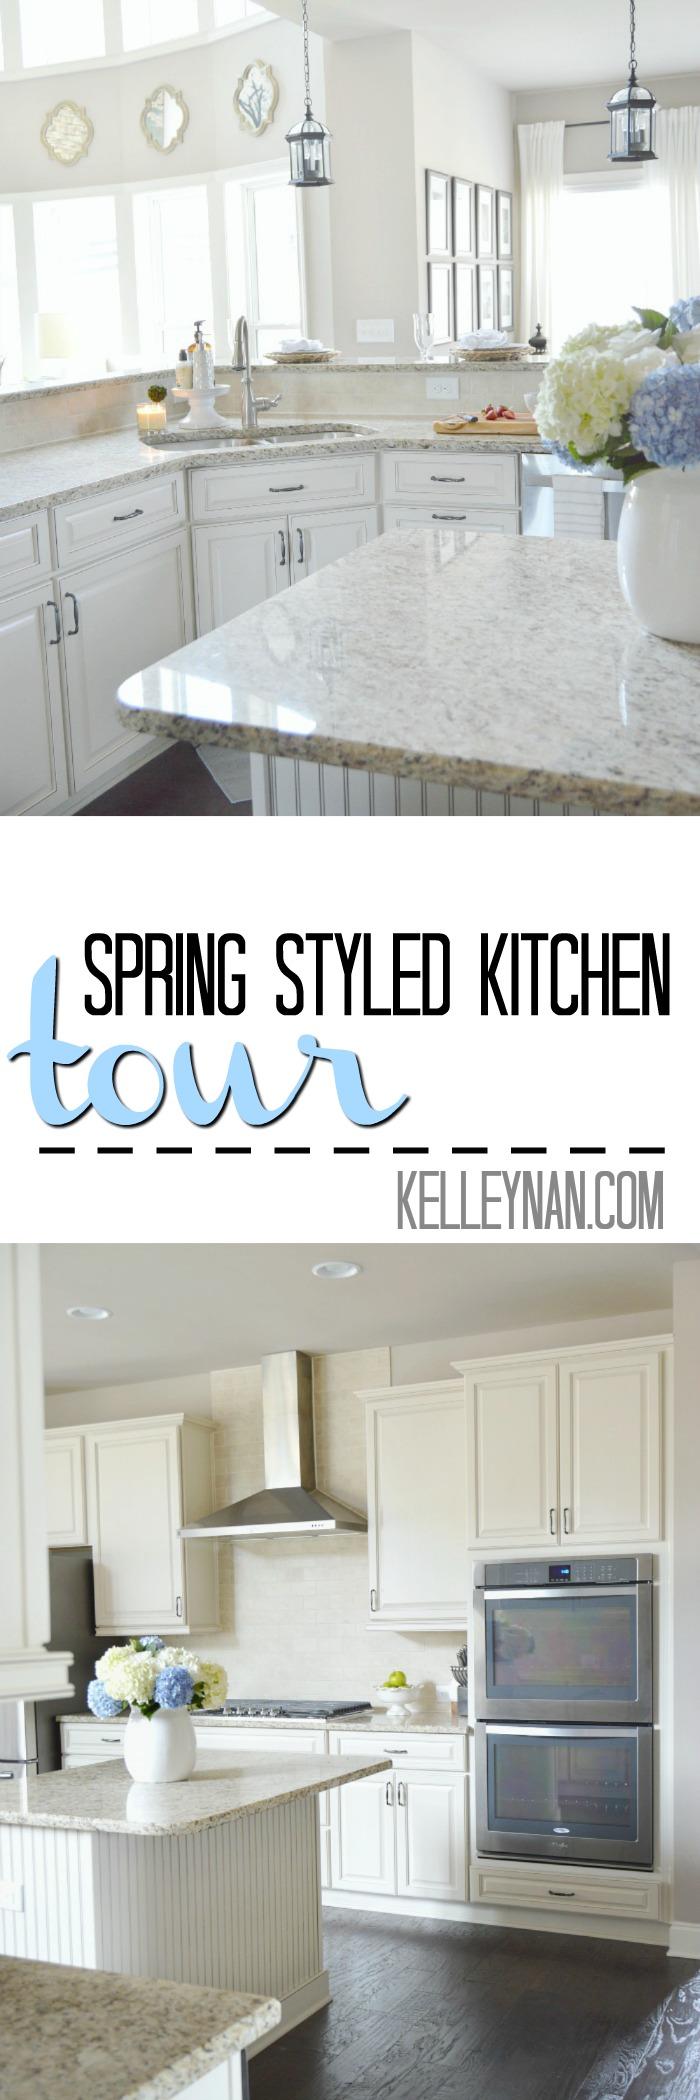 Spring Styled Neutral Kitchen with Hydrangeas